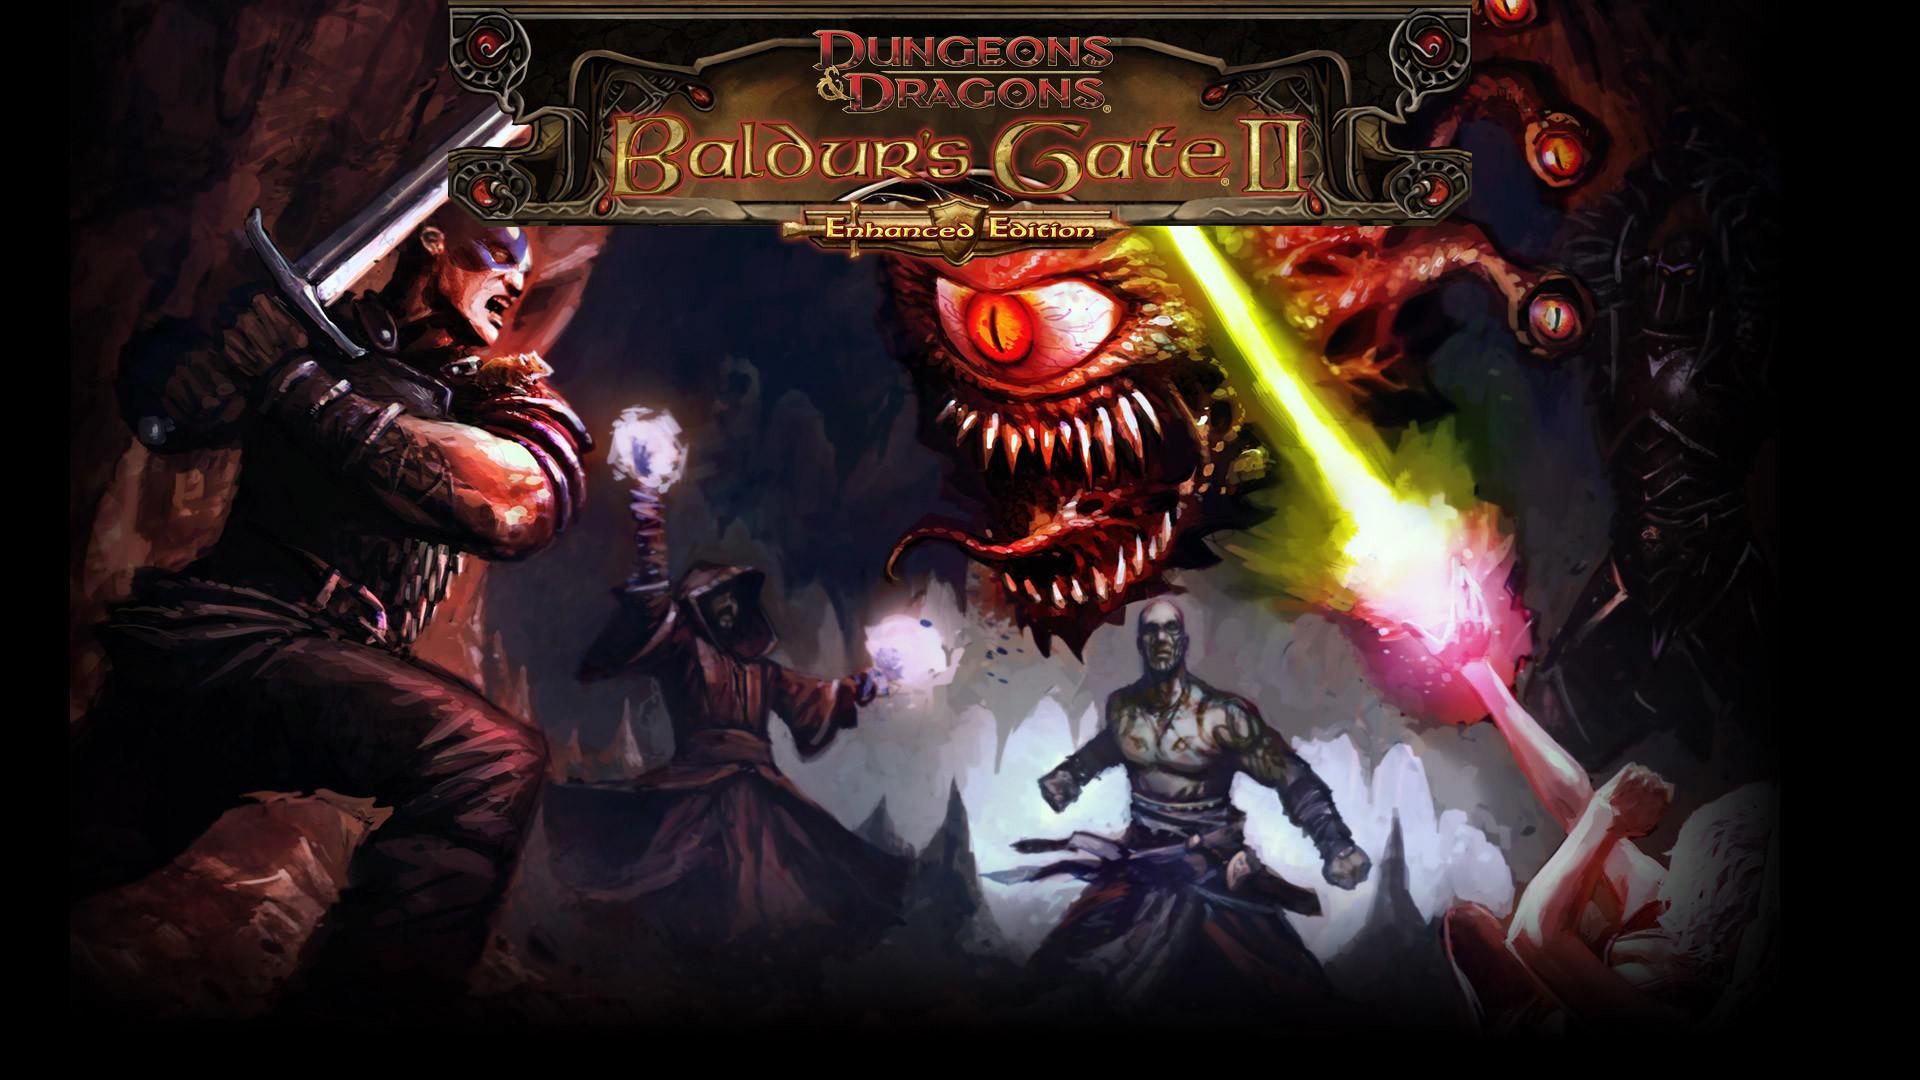 Baldur's Gate II: Shadows of Amn (game) | Forgotten Realms Wiki | FANDOM  powered by Wikia